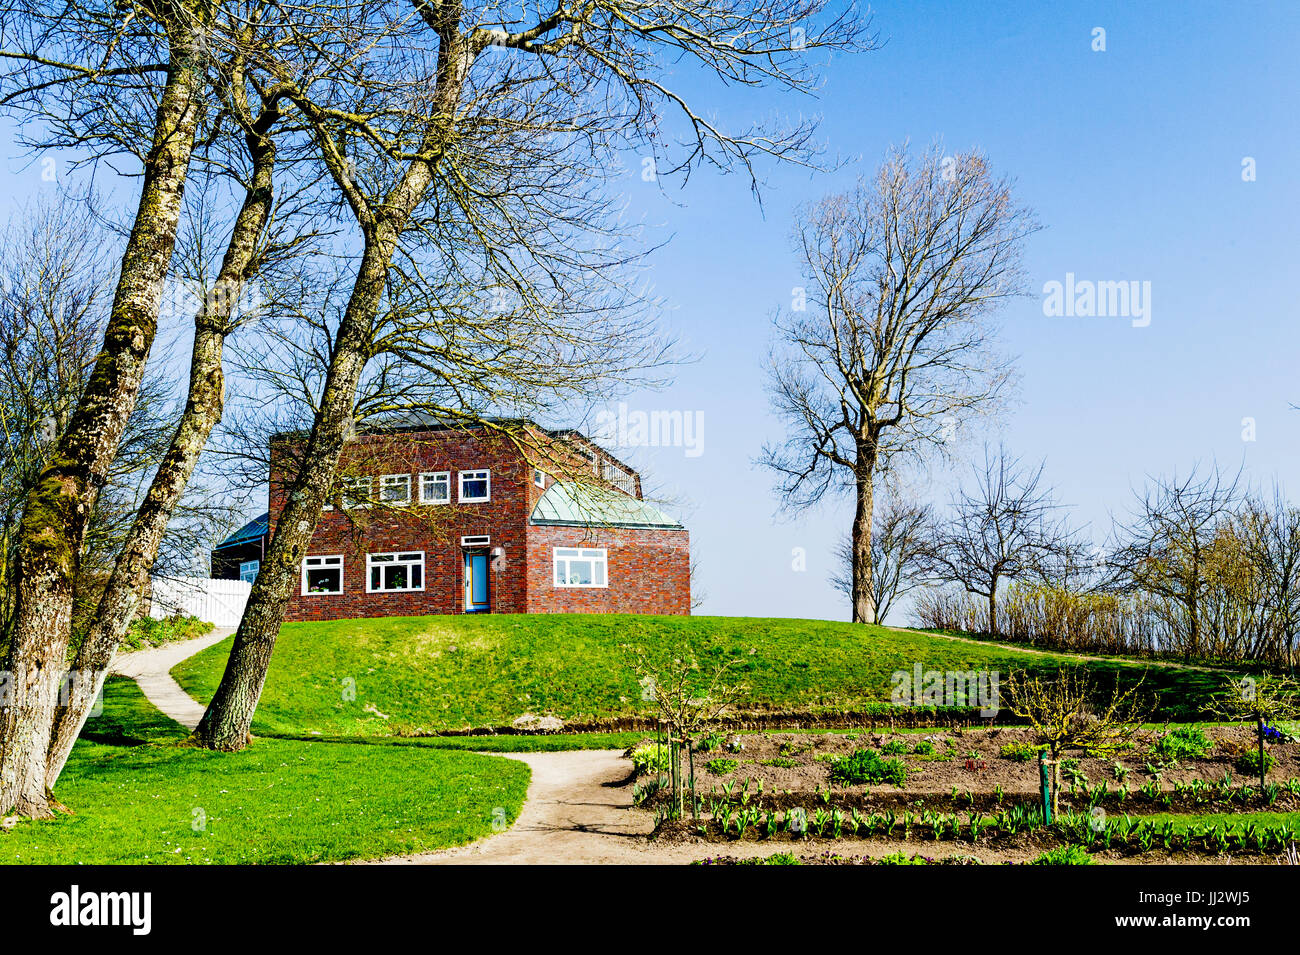 Nolde Nolde Museum Stockfotos & Nolde Nolde Museum Bilder